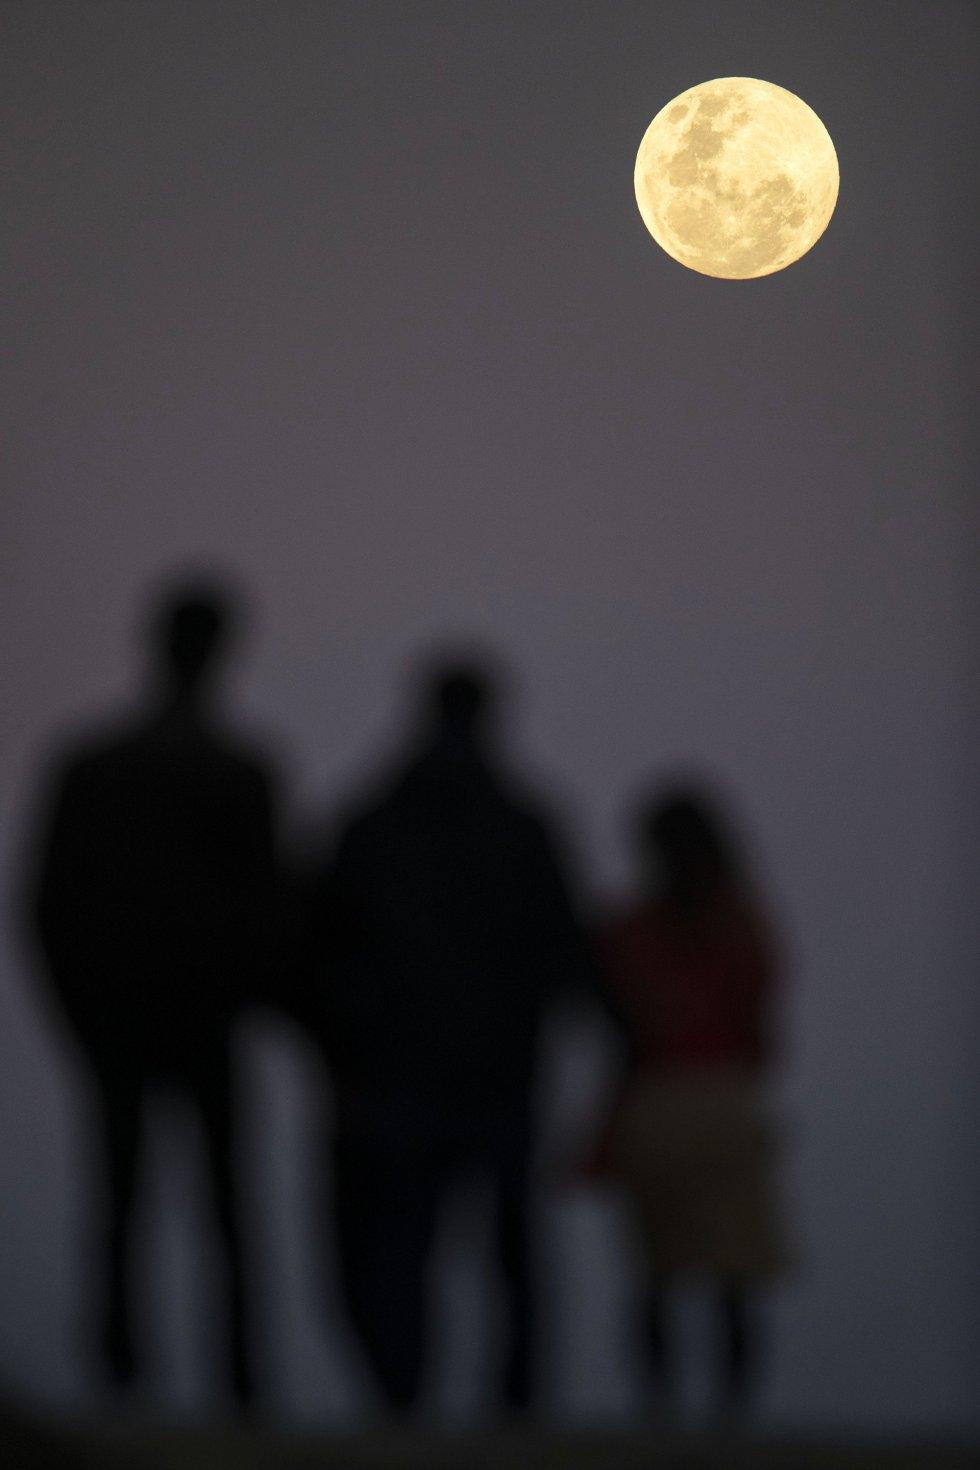 La luna llena se eleva cerca de la playa de Bondi de Sídney antes del eclipse lunar.